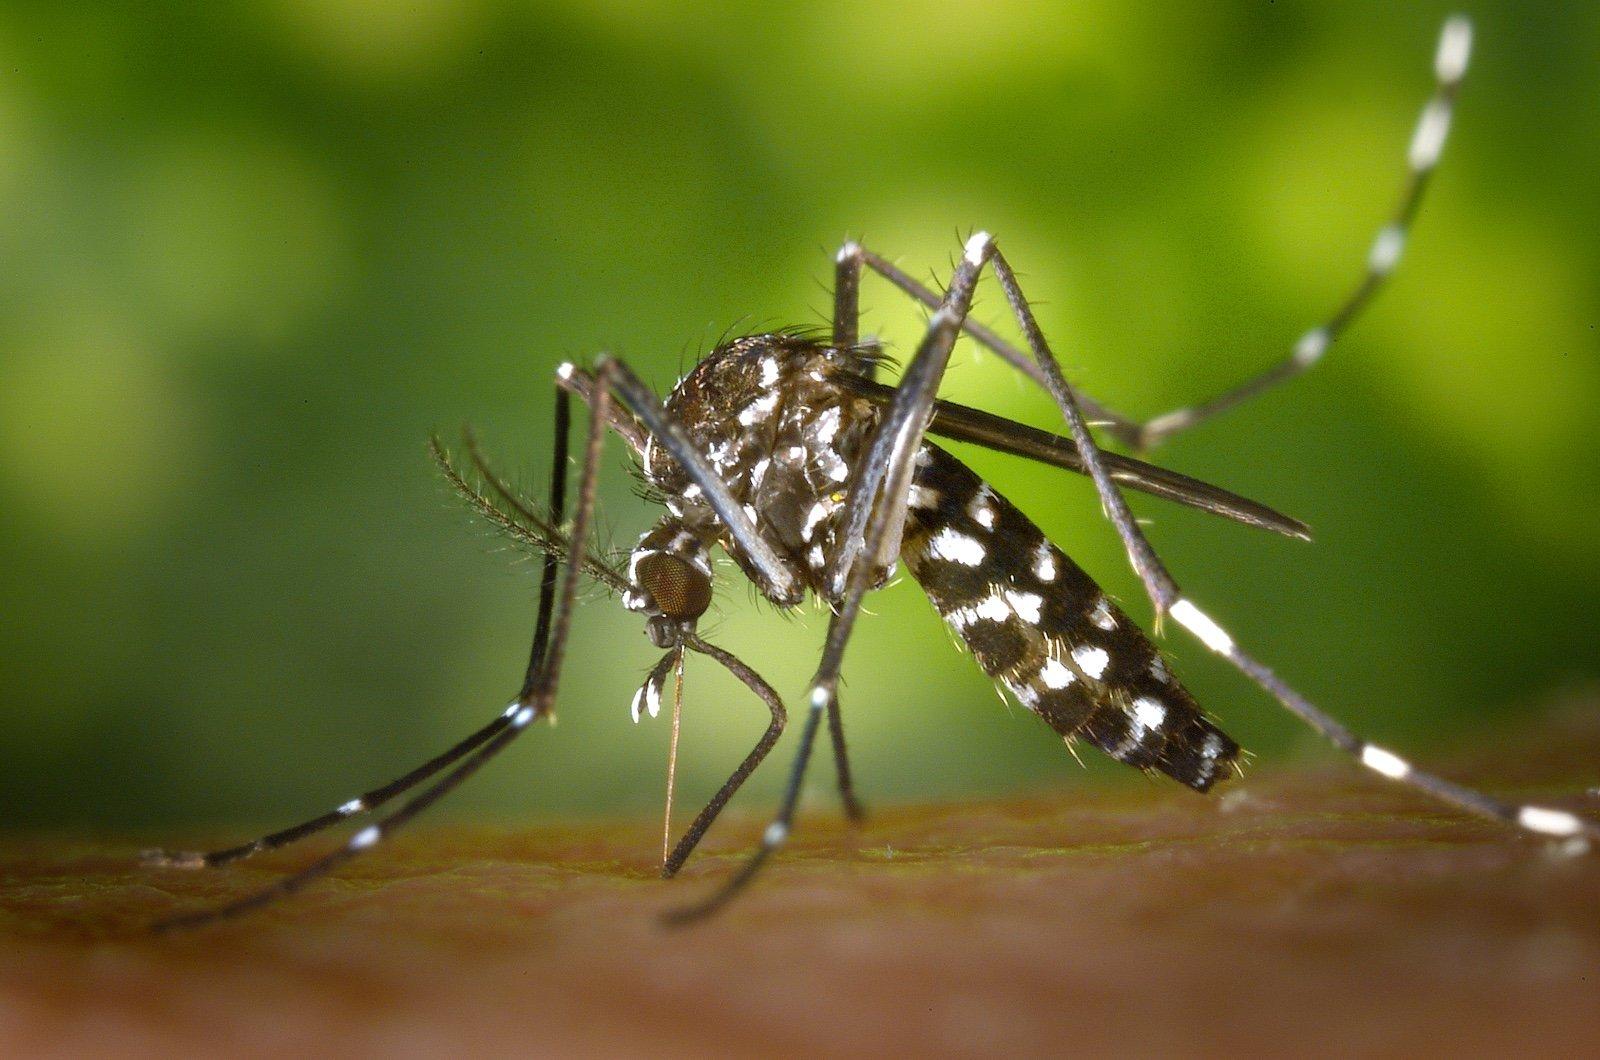 Zika Virus Infection in Pregnant Women